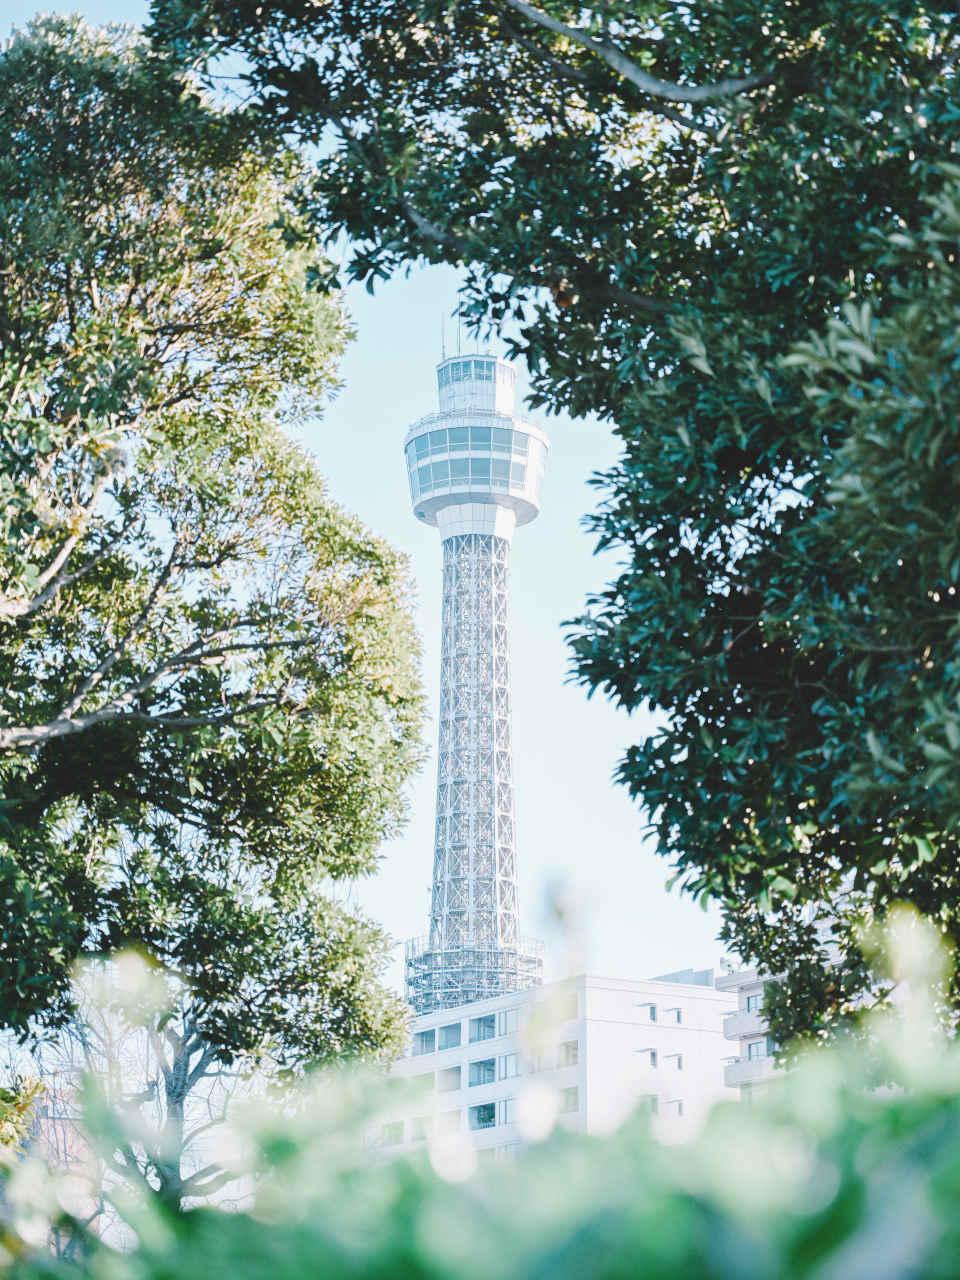 Yokohama Stories - 横浜を舞台に、5人のフォトグラファーが写真で描く物語